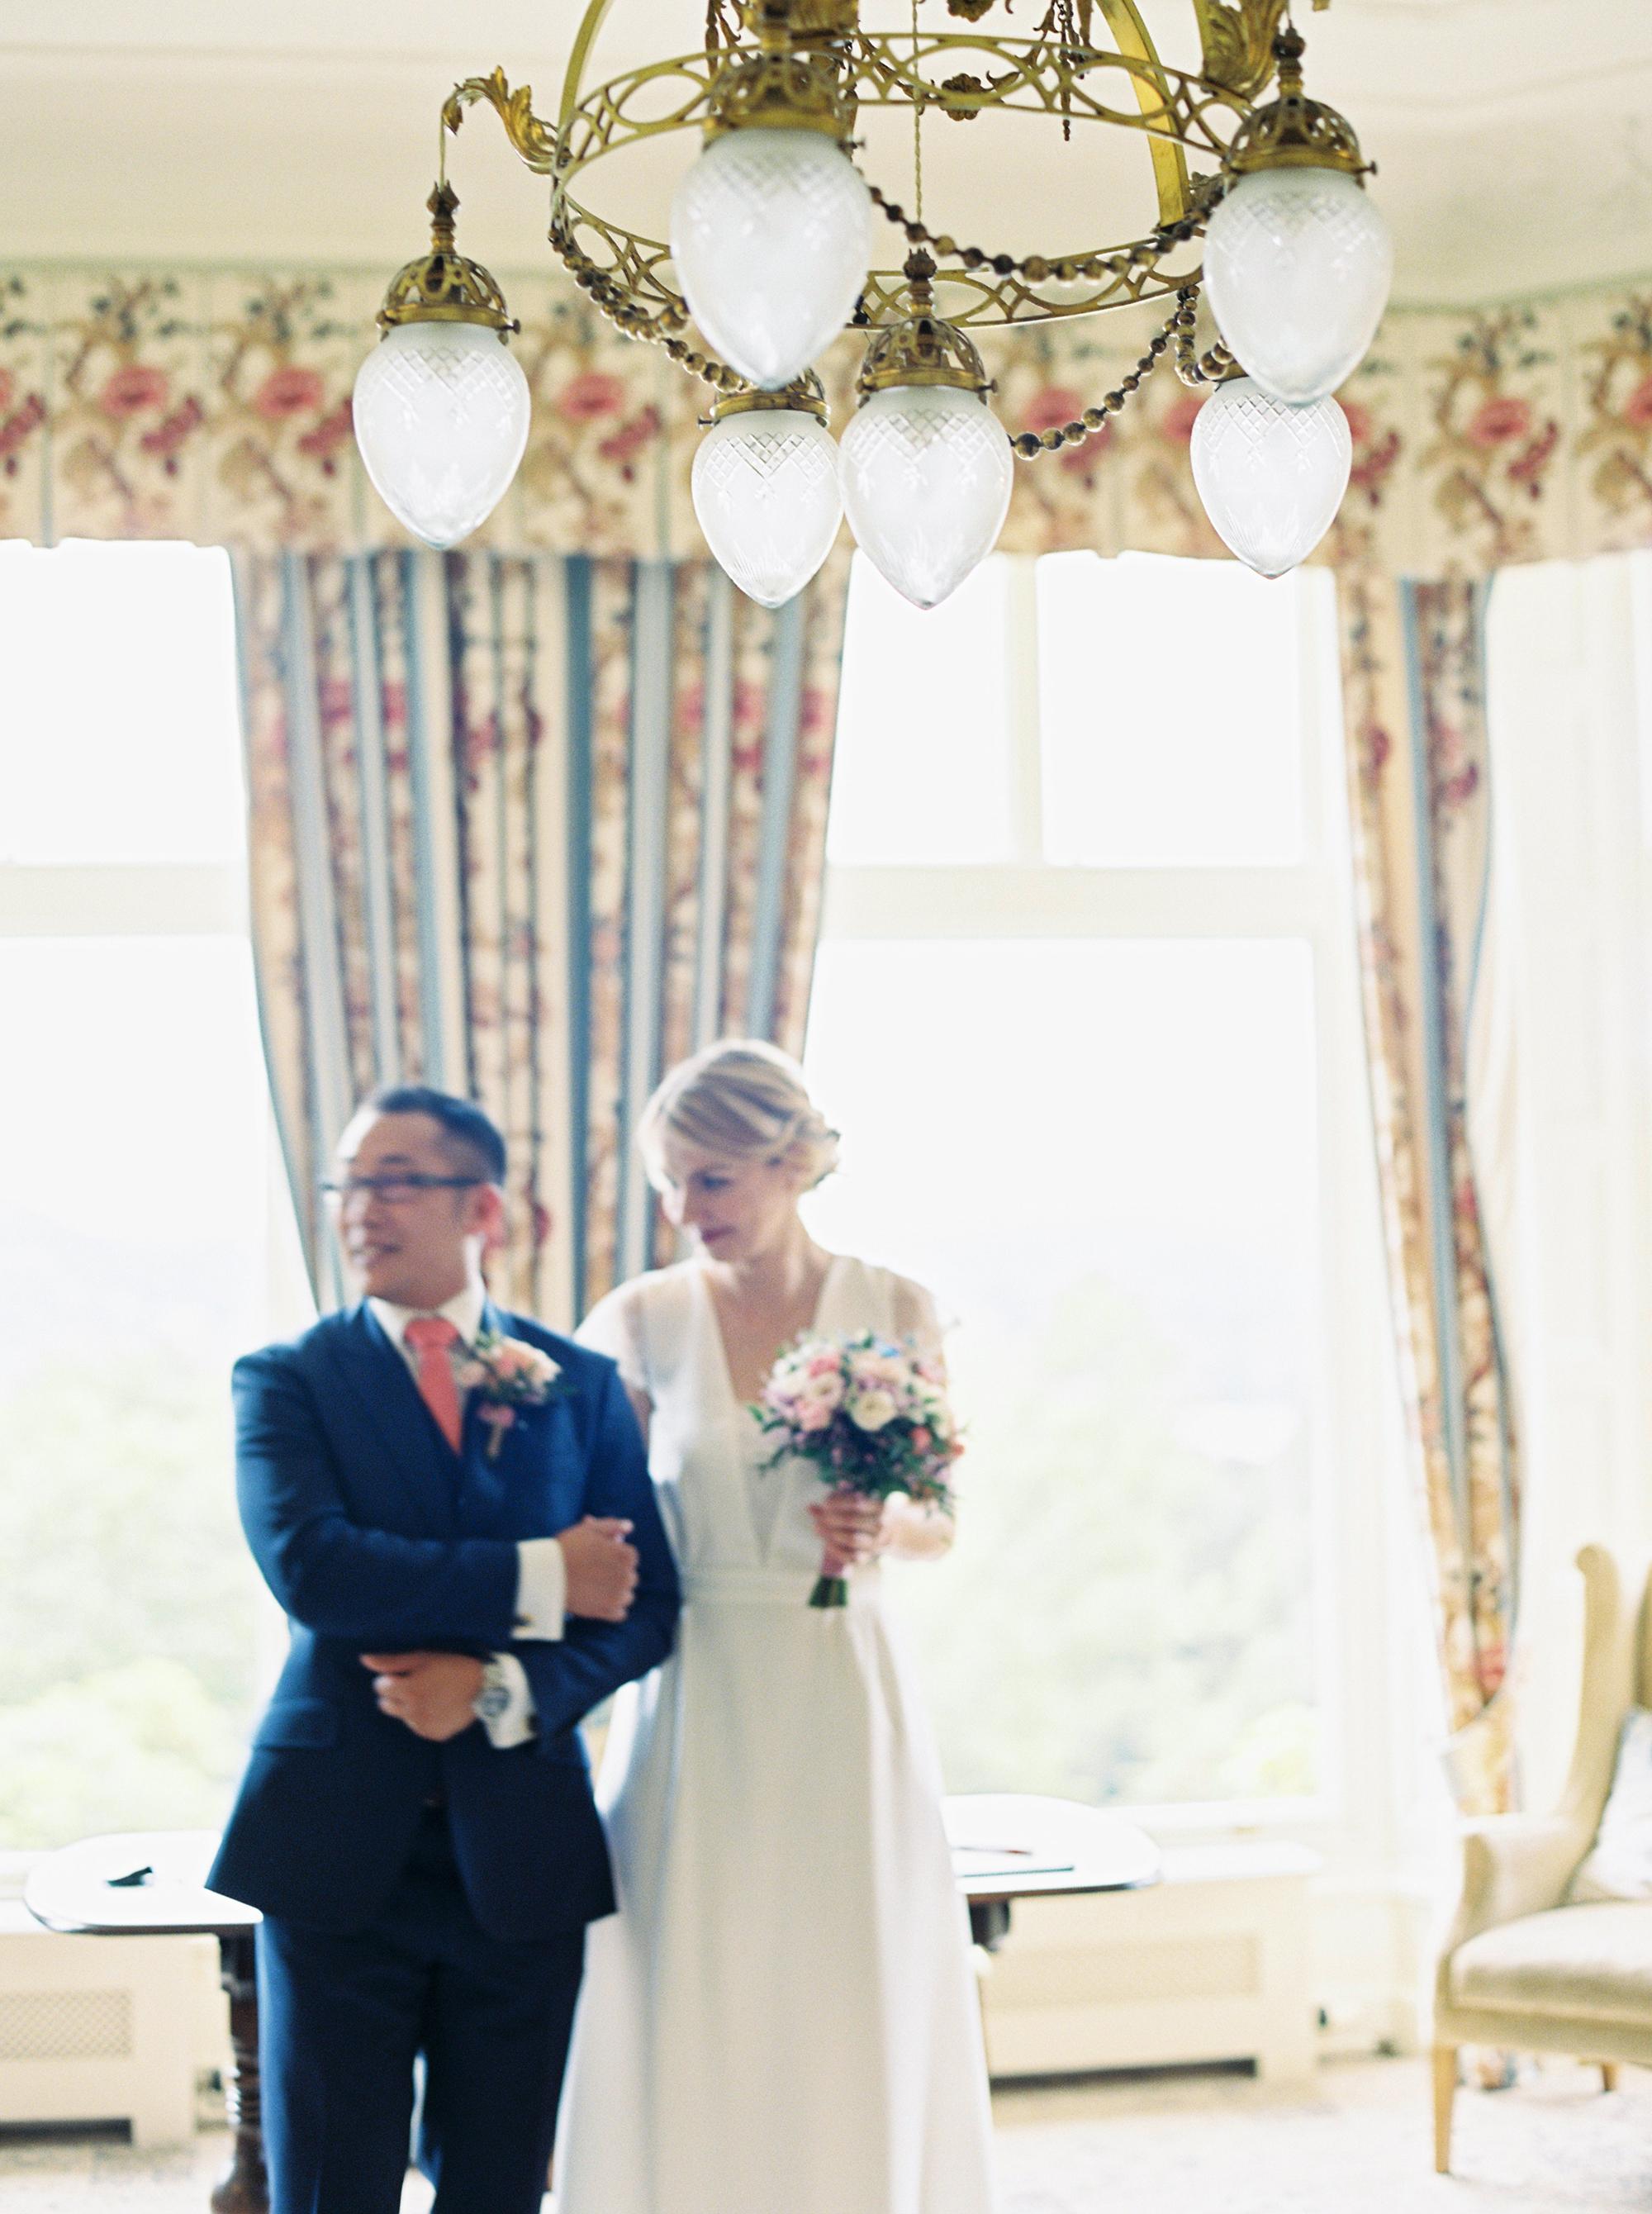 wedding_photographer_cumbria075.jpg